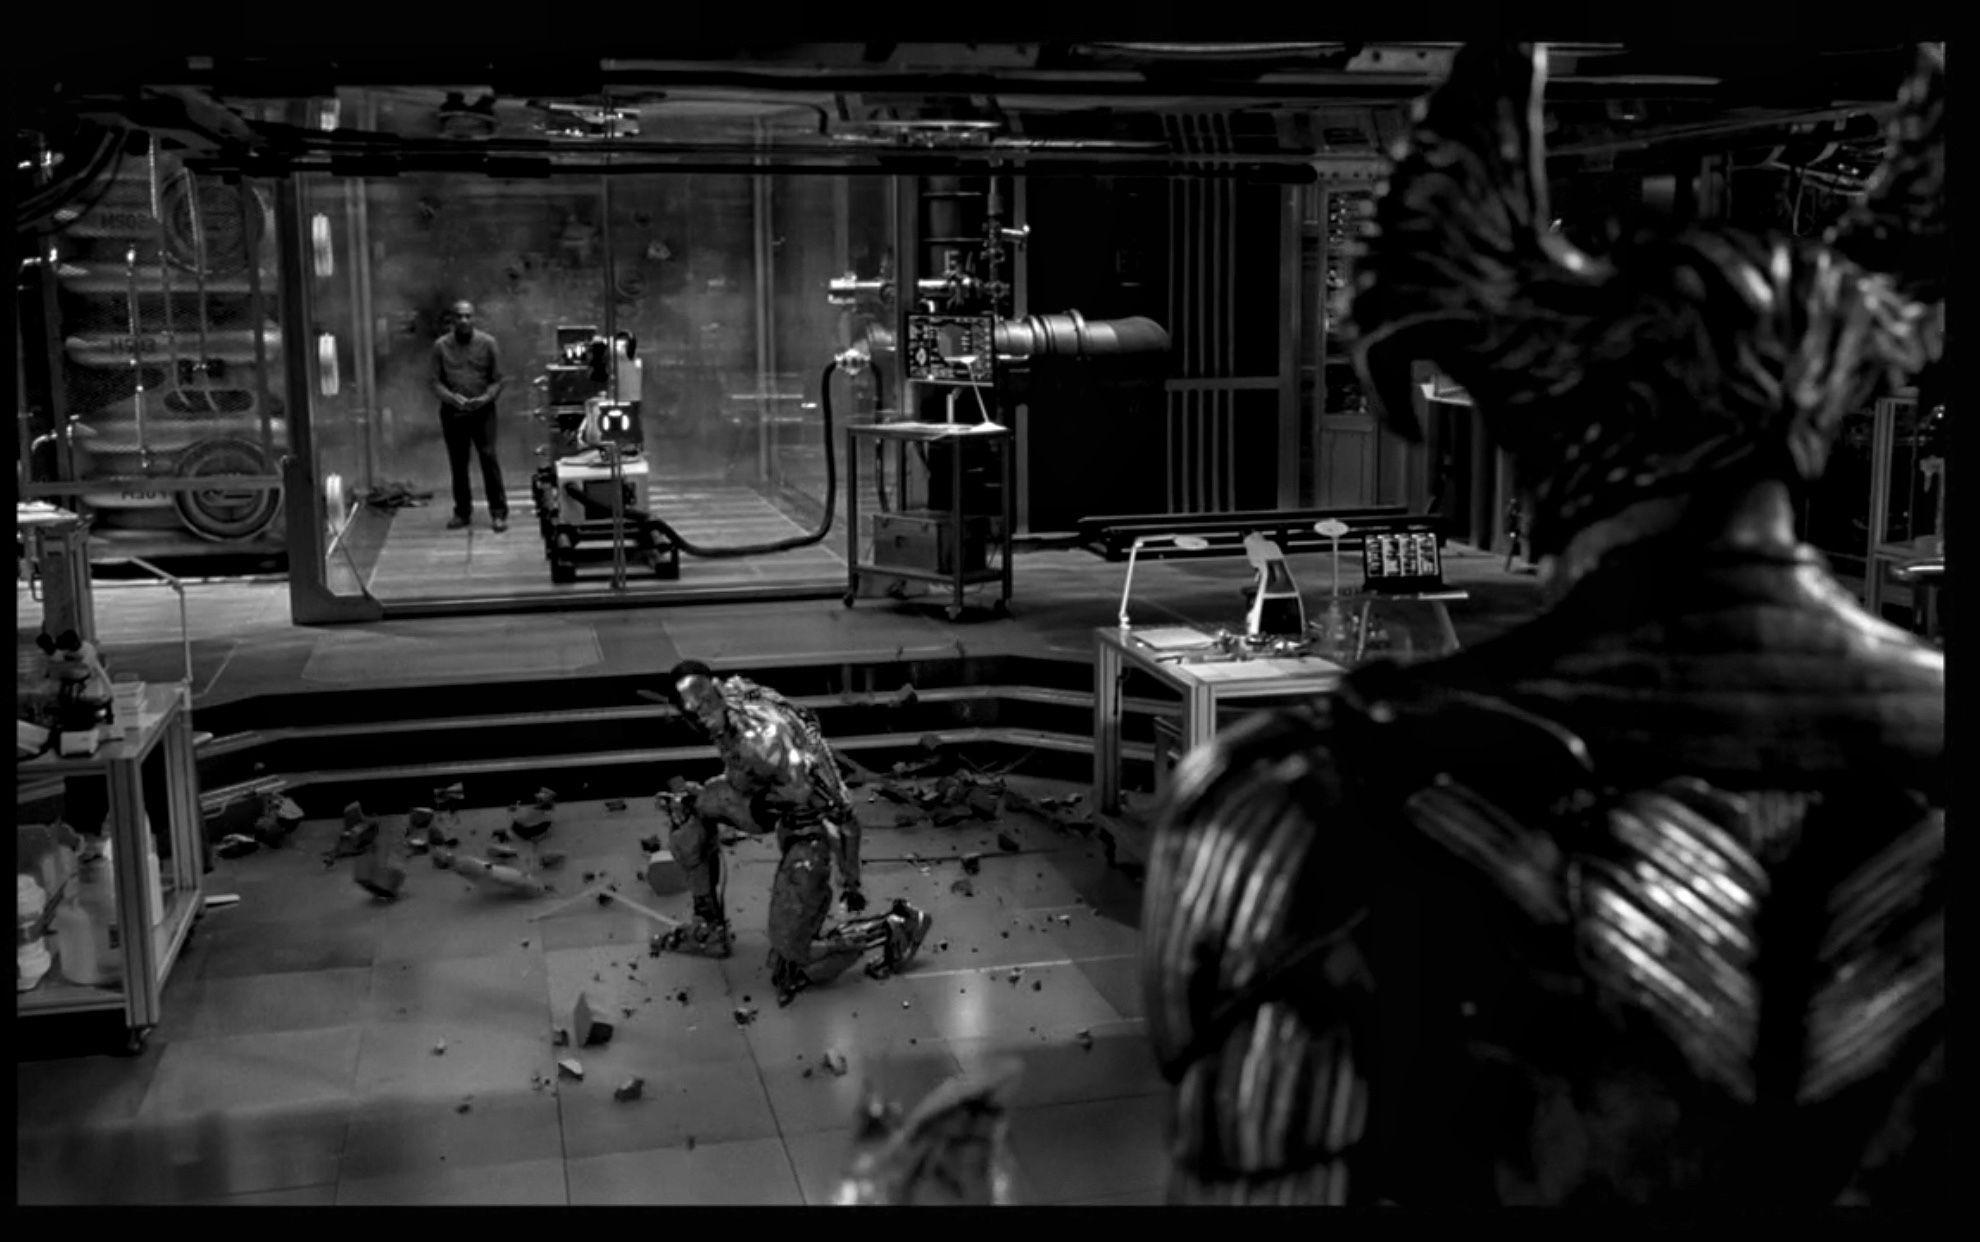 Zack Snyder Shared A Photo On Vero Justice League Justice League Trailer Batman Vs Superman Movie